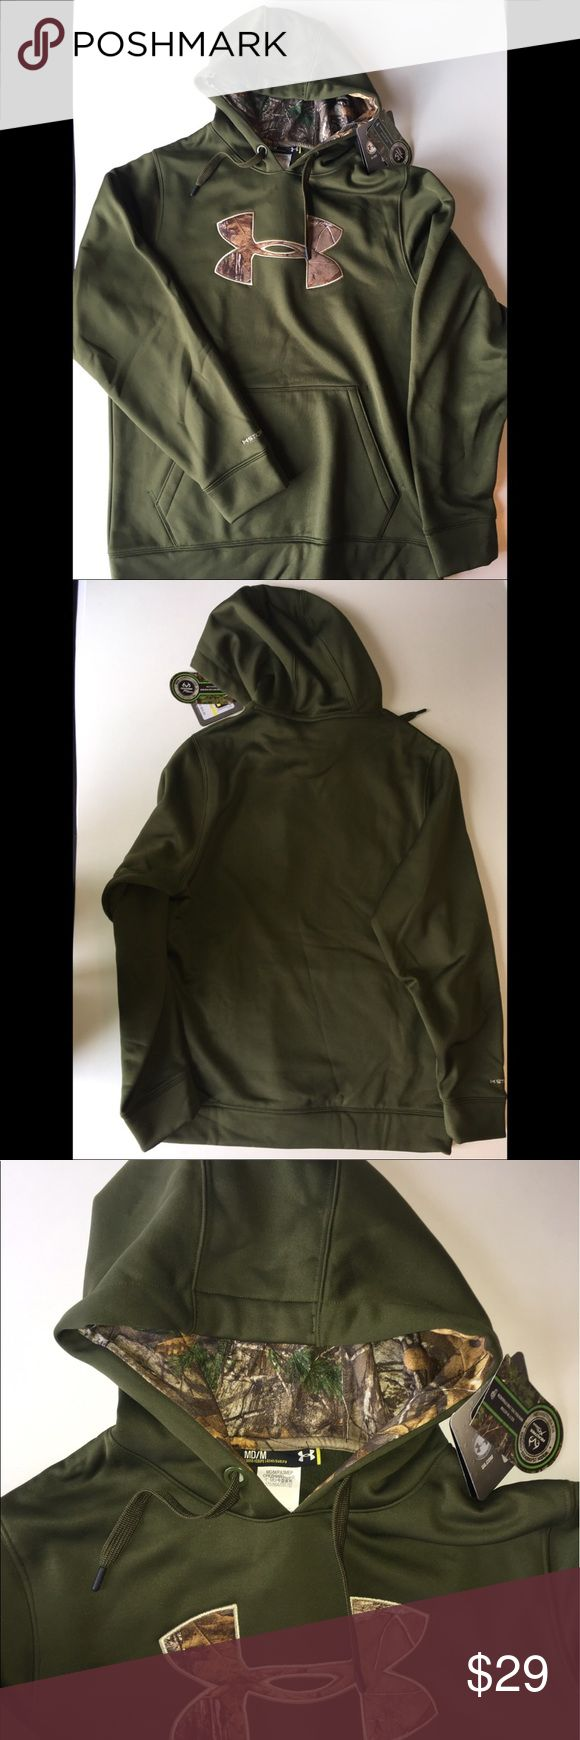 Brand New‼️ Under Armour Camo sweatshirt size M Brand New‼️ Under Armour Camo sweatshirt size M Under Armour Shirts Sweatshirts & Hoodies